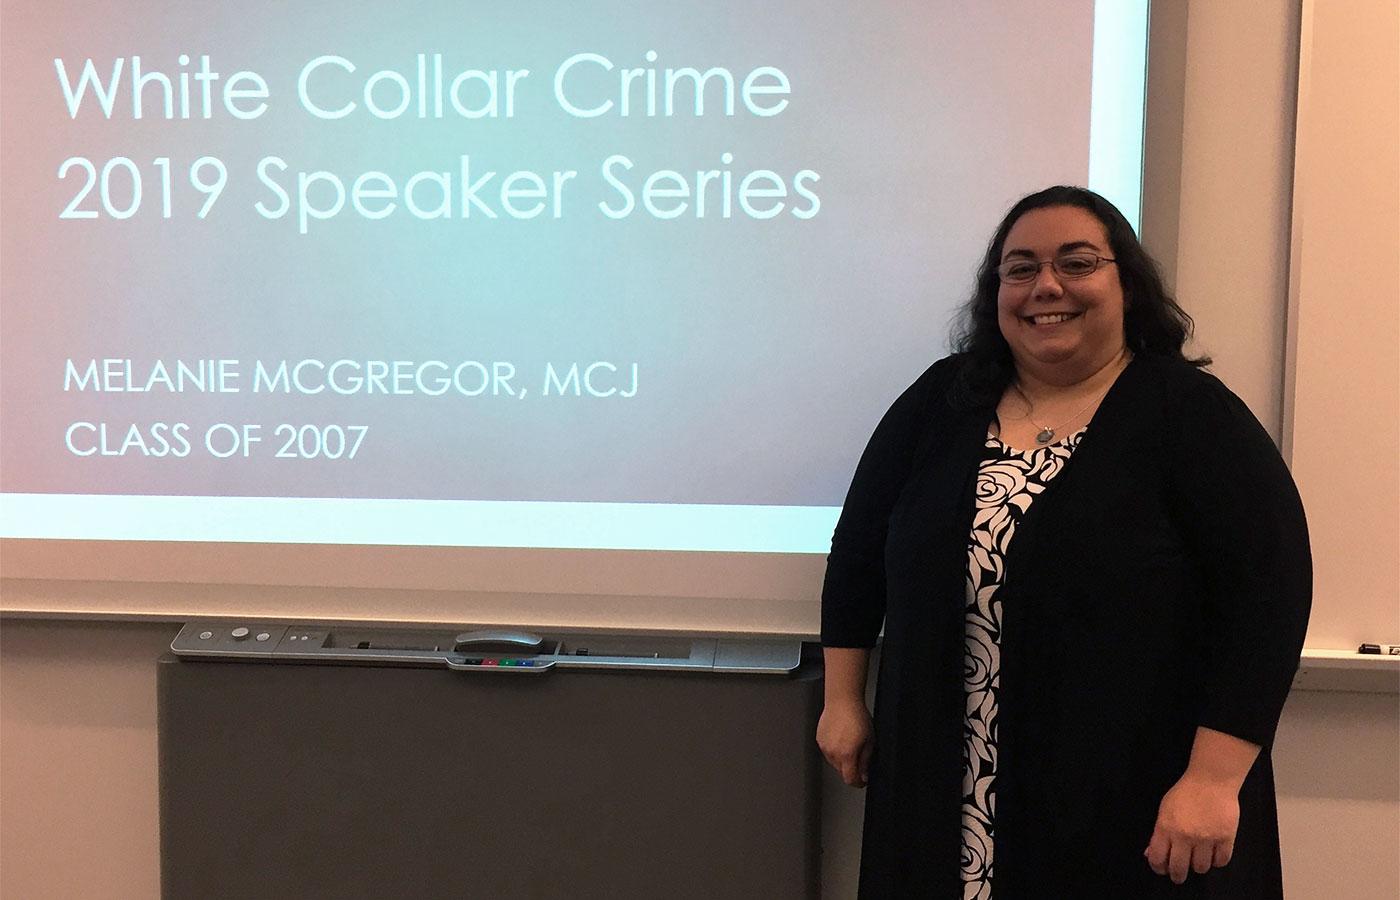 Melanie McGregor on White Collar Crimes